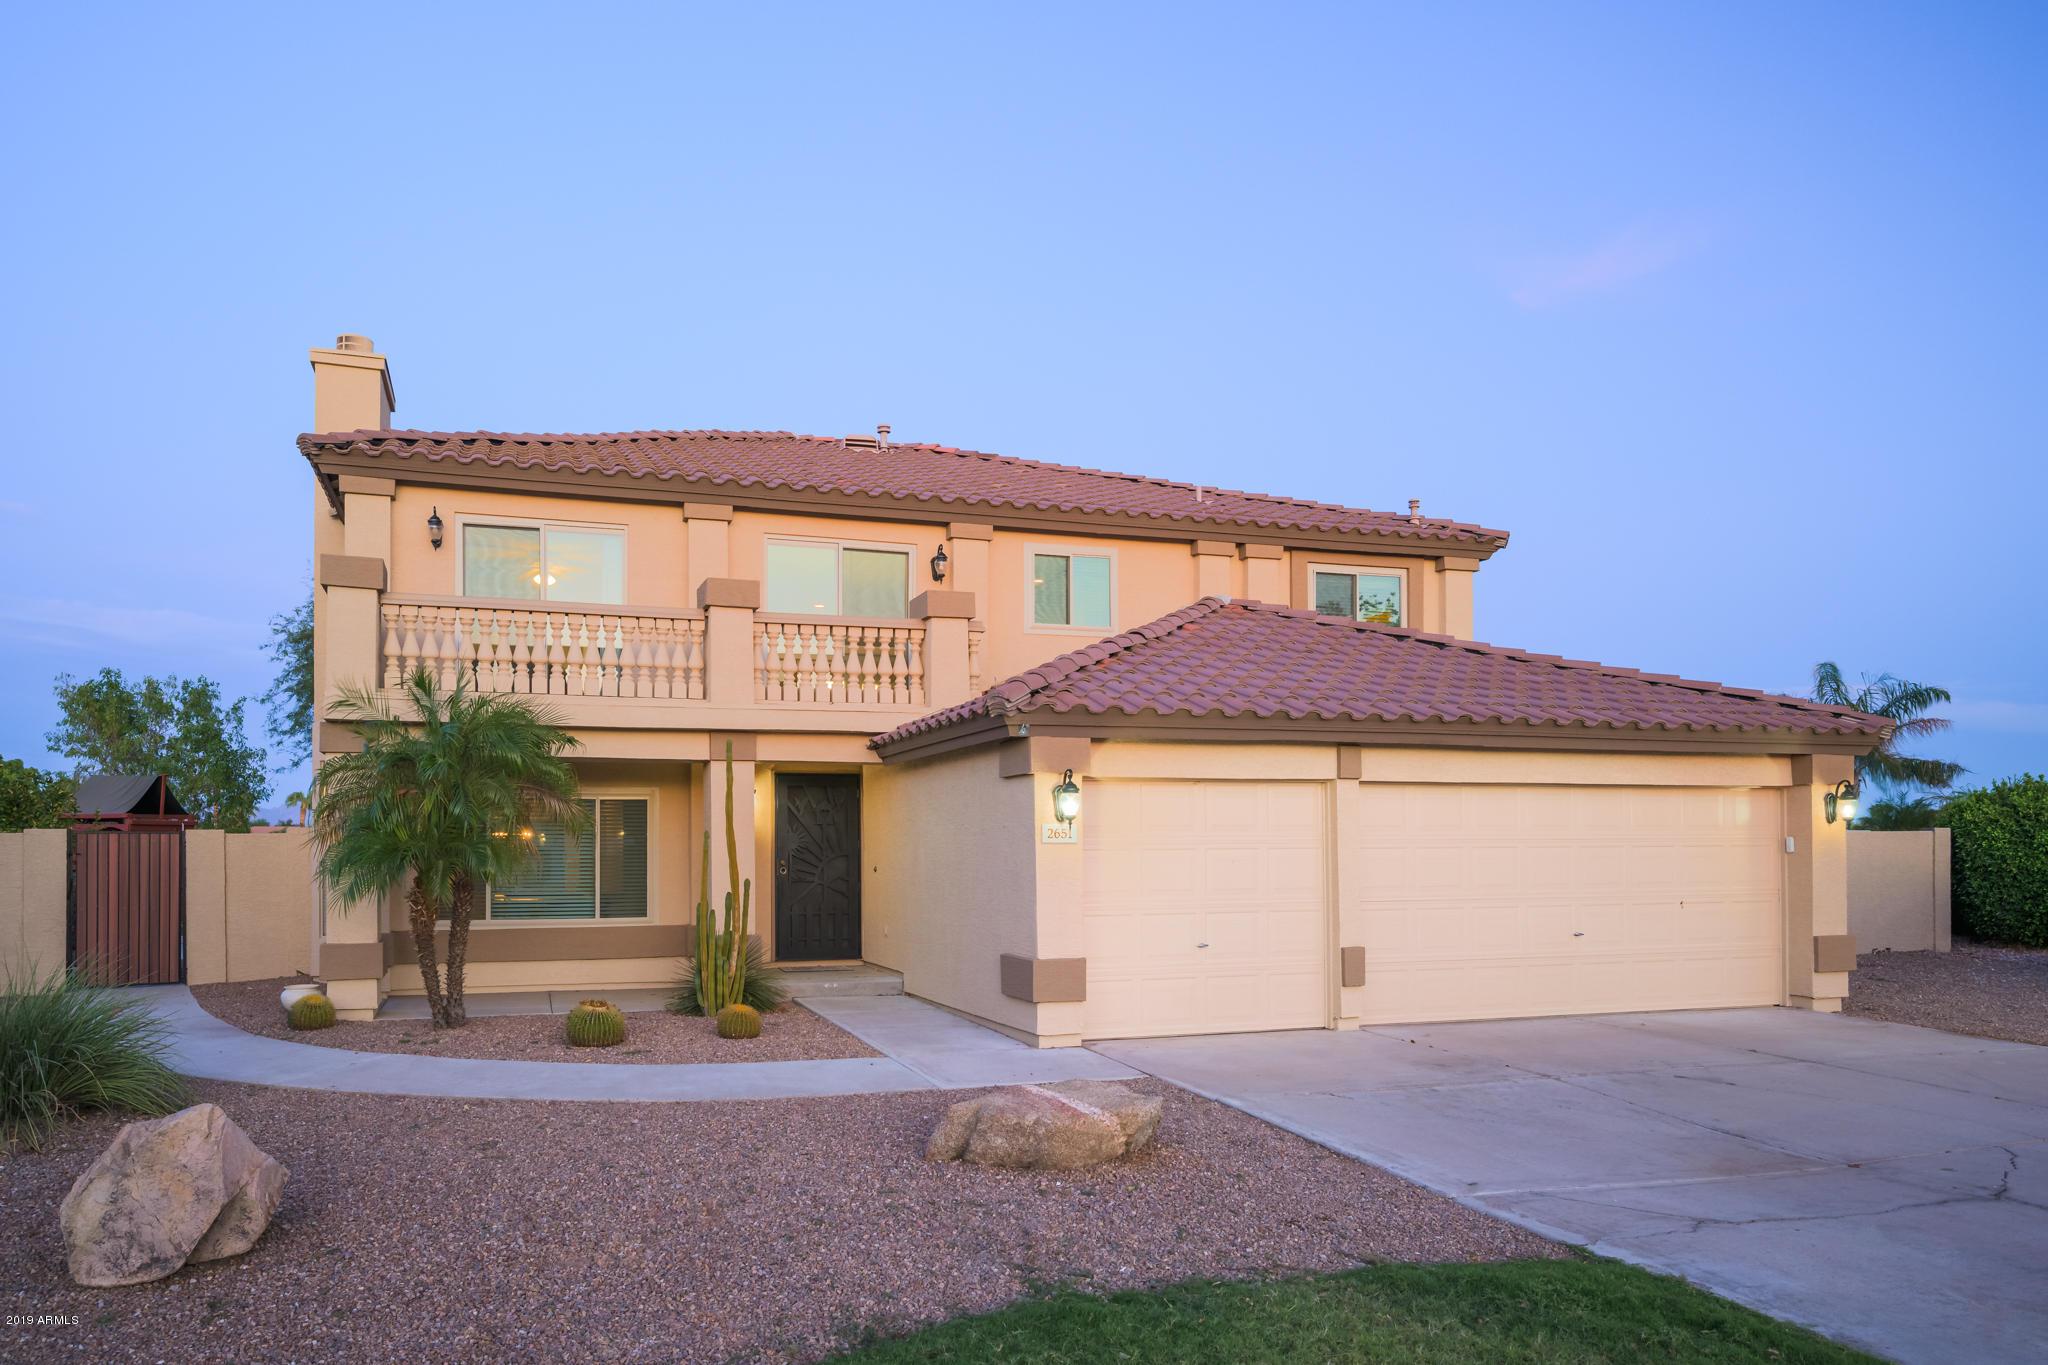 Photo of 2651 E CATCLAW Street, Gilbert, AZ 85296